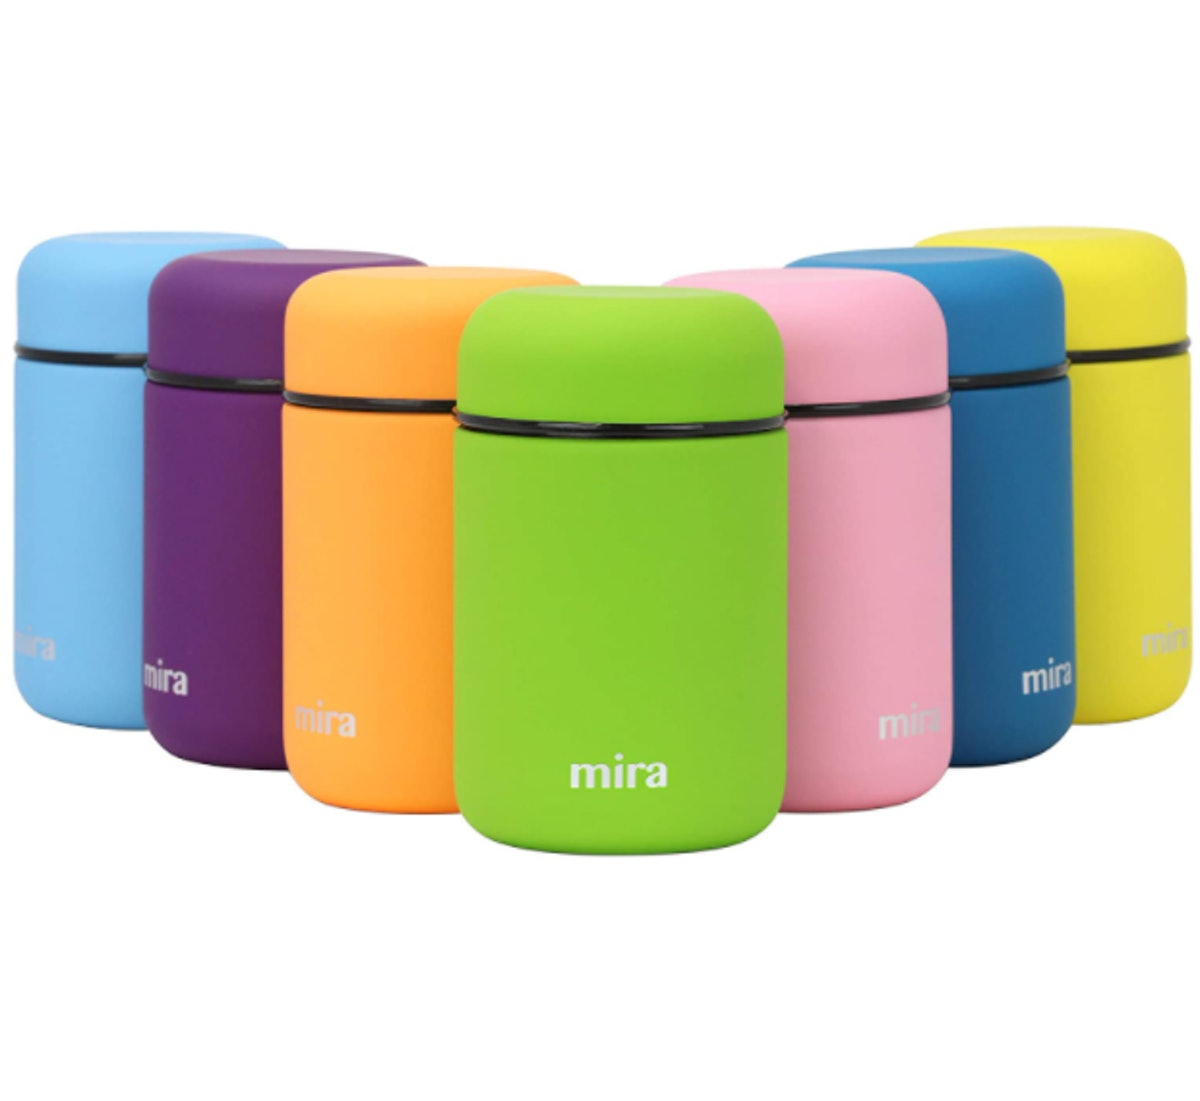 MIRA Vacuum Insulated Food Jar